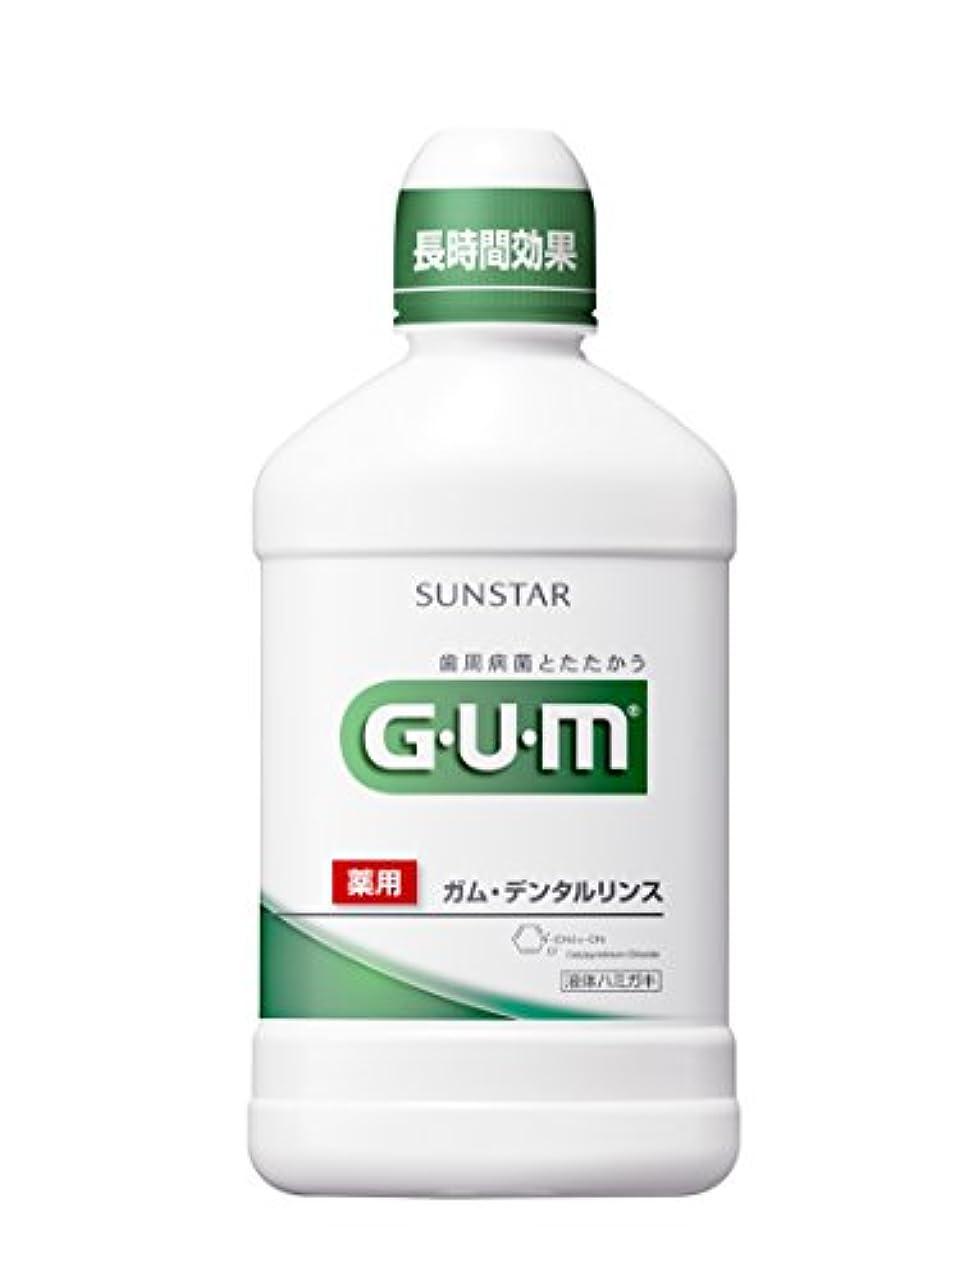 GUMデンタルリンス500ML レギュラー [医薬部外品]